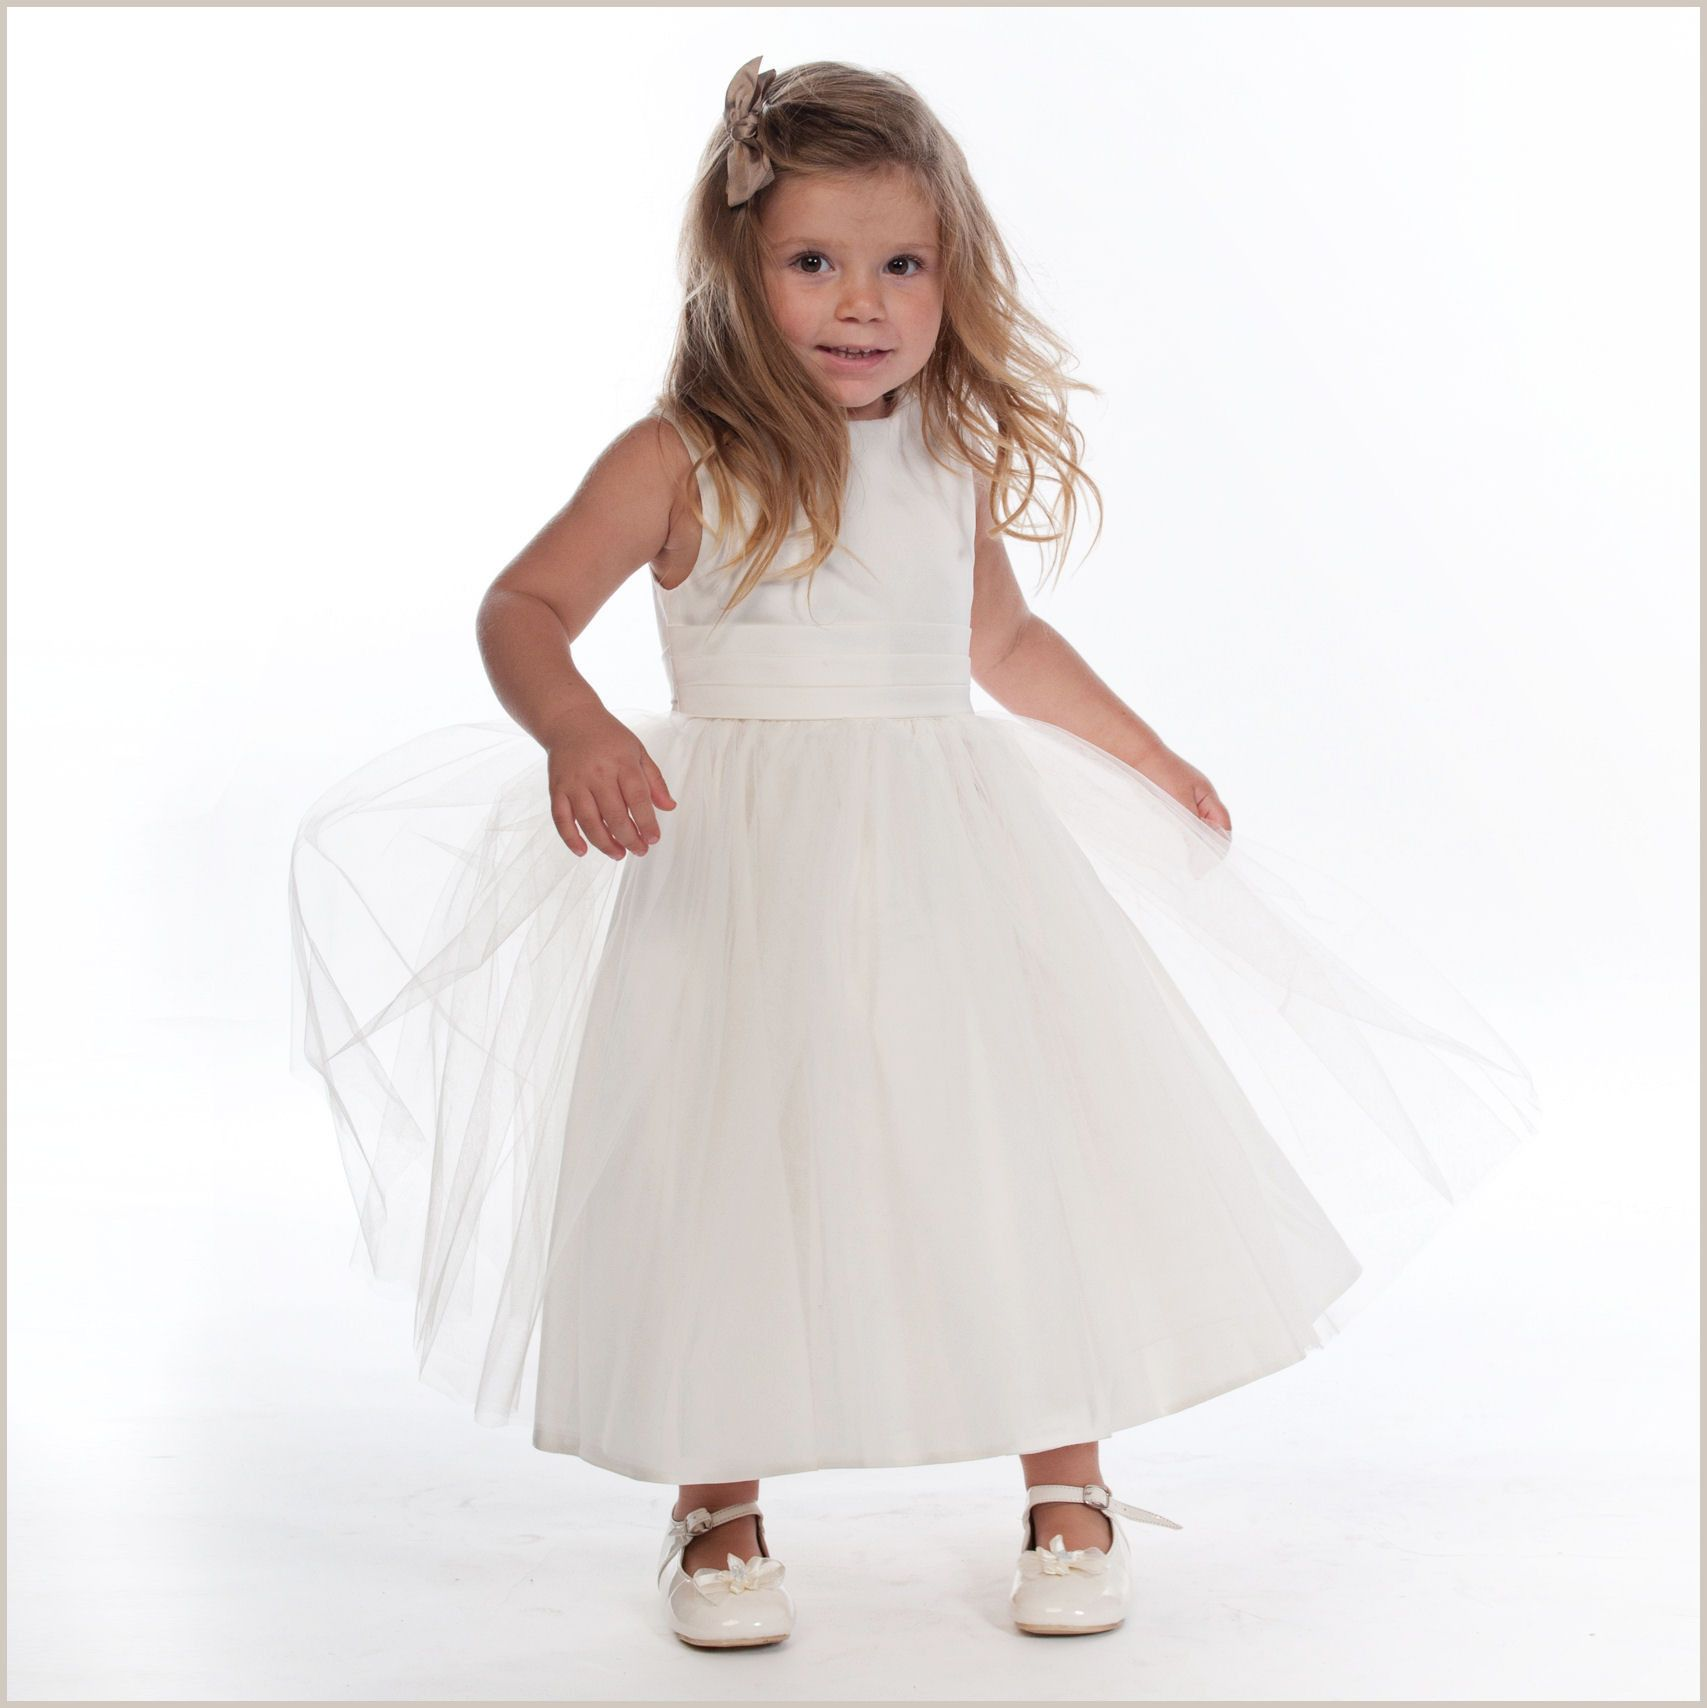 Demigirlcouk vienna ivory tulle dress with ivory sash